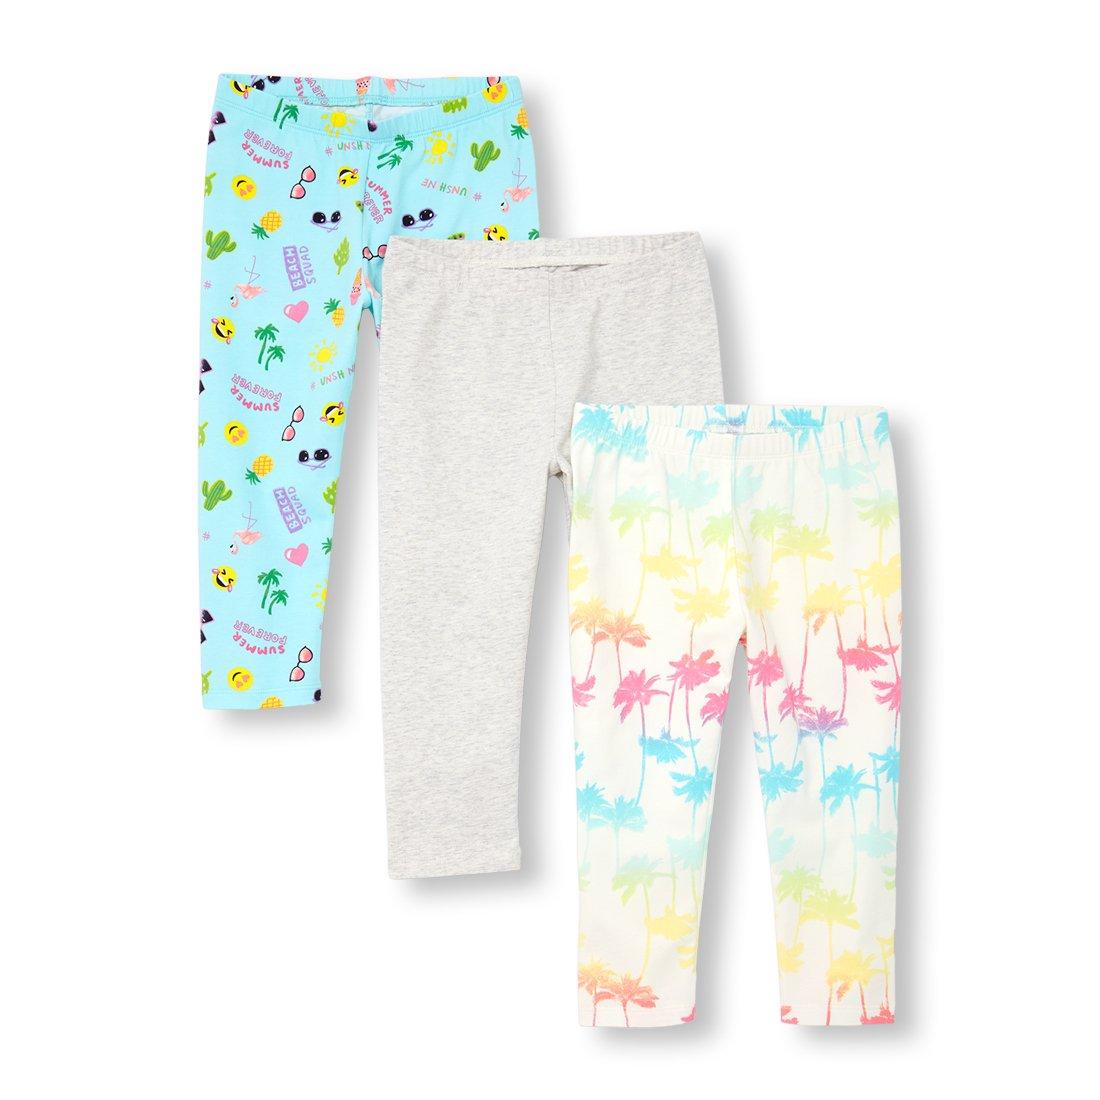 The Children's Place Big Girls' Fashion Leggings, Simplywht 00909, L (10/12)